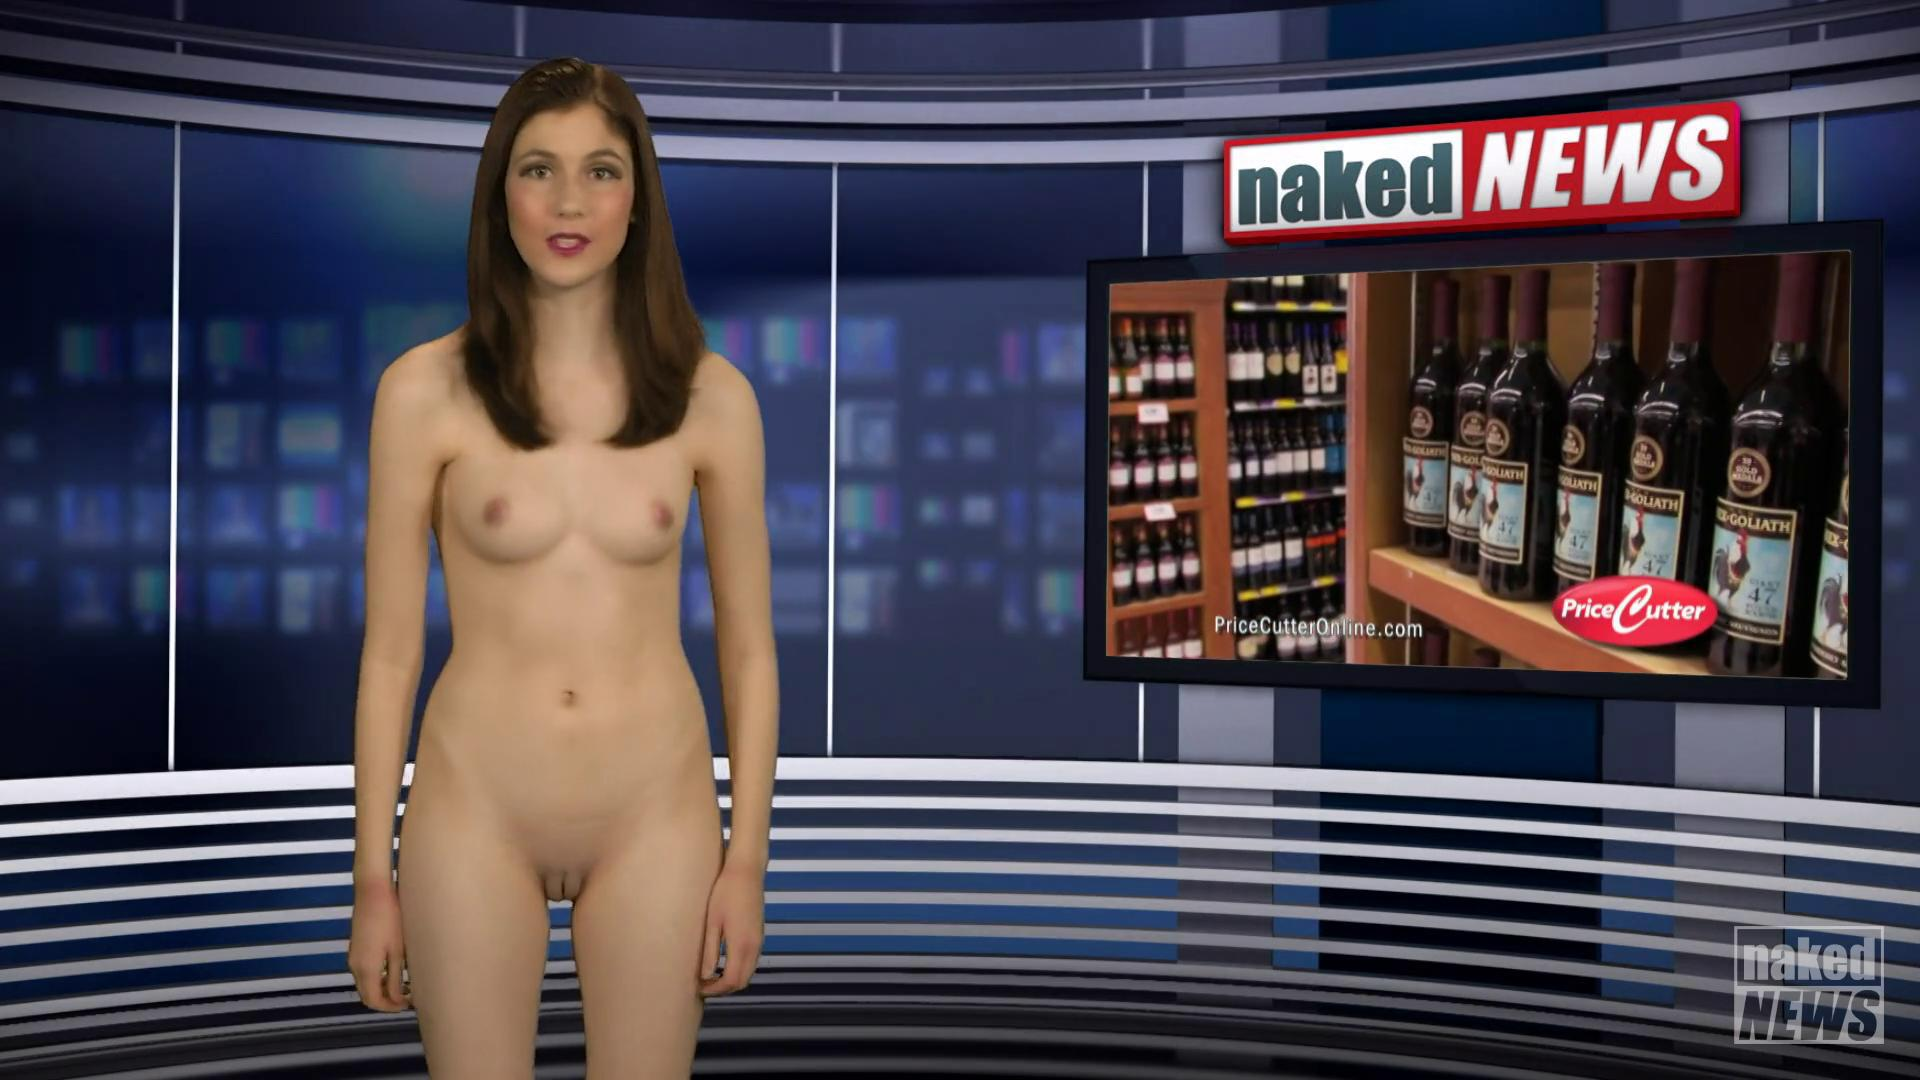 Naked news reader of indian origin